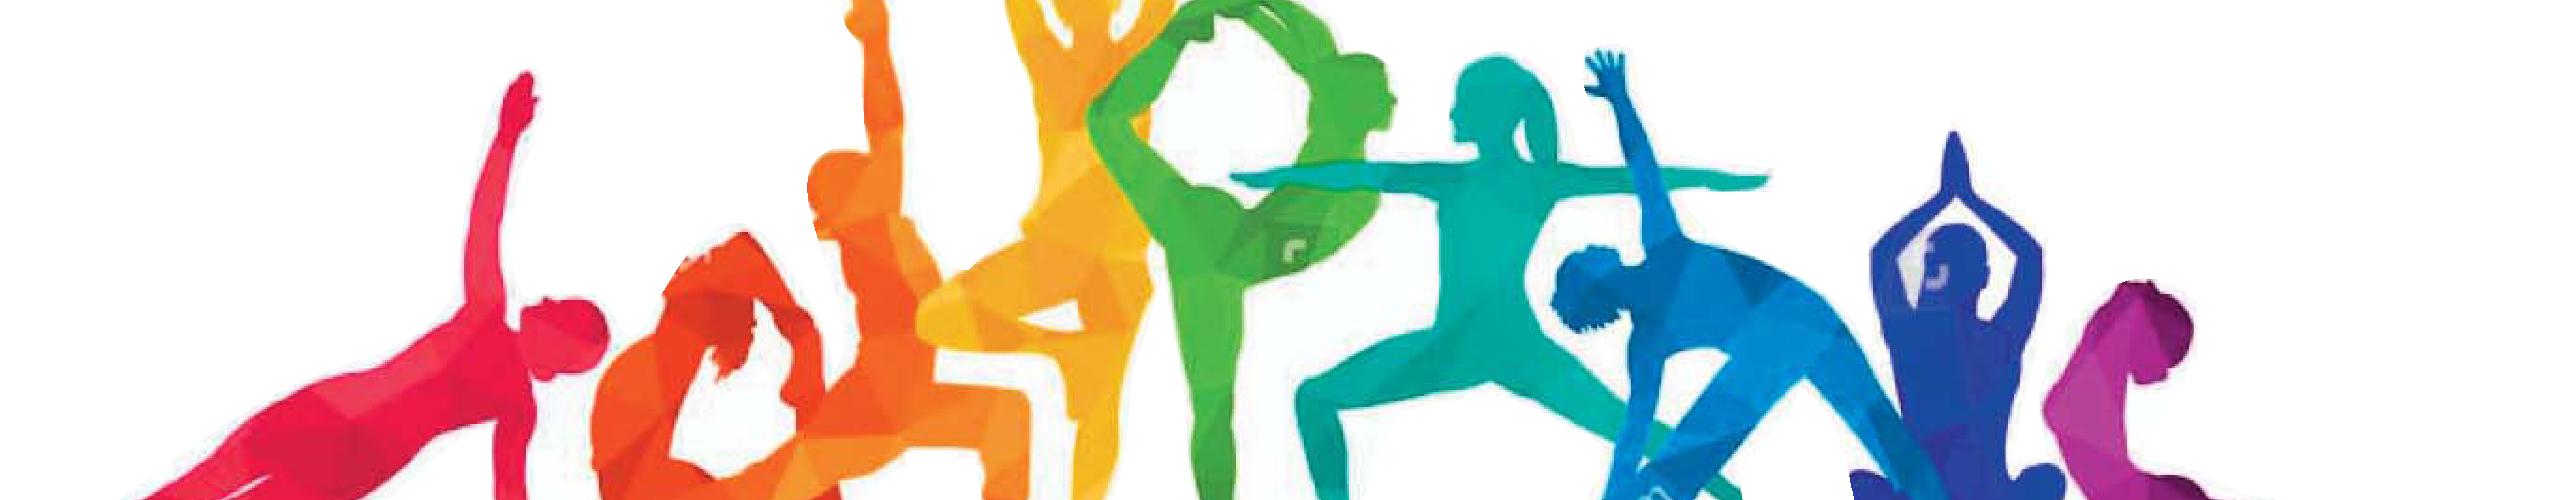 Yoga 4 health panel background